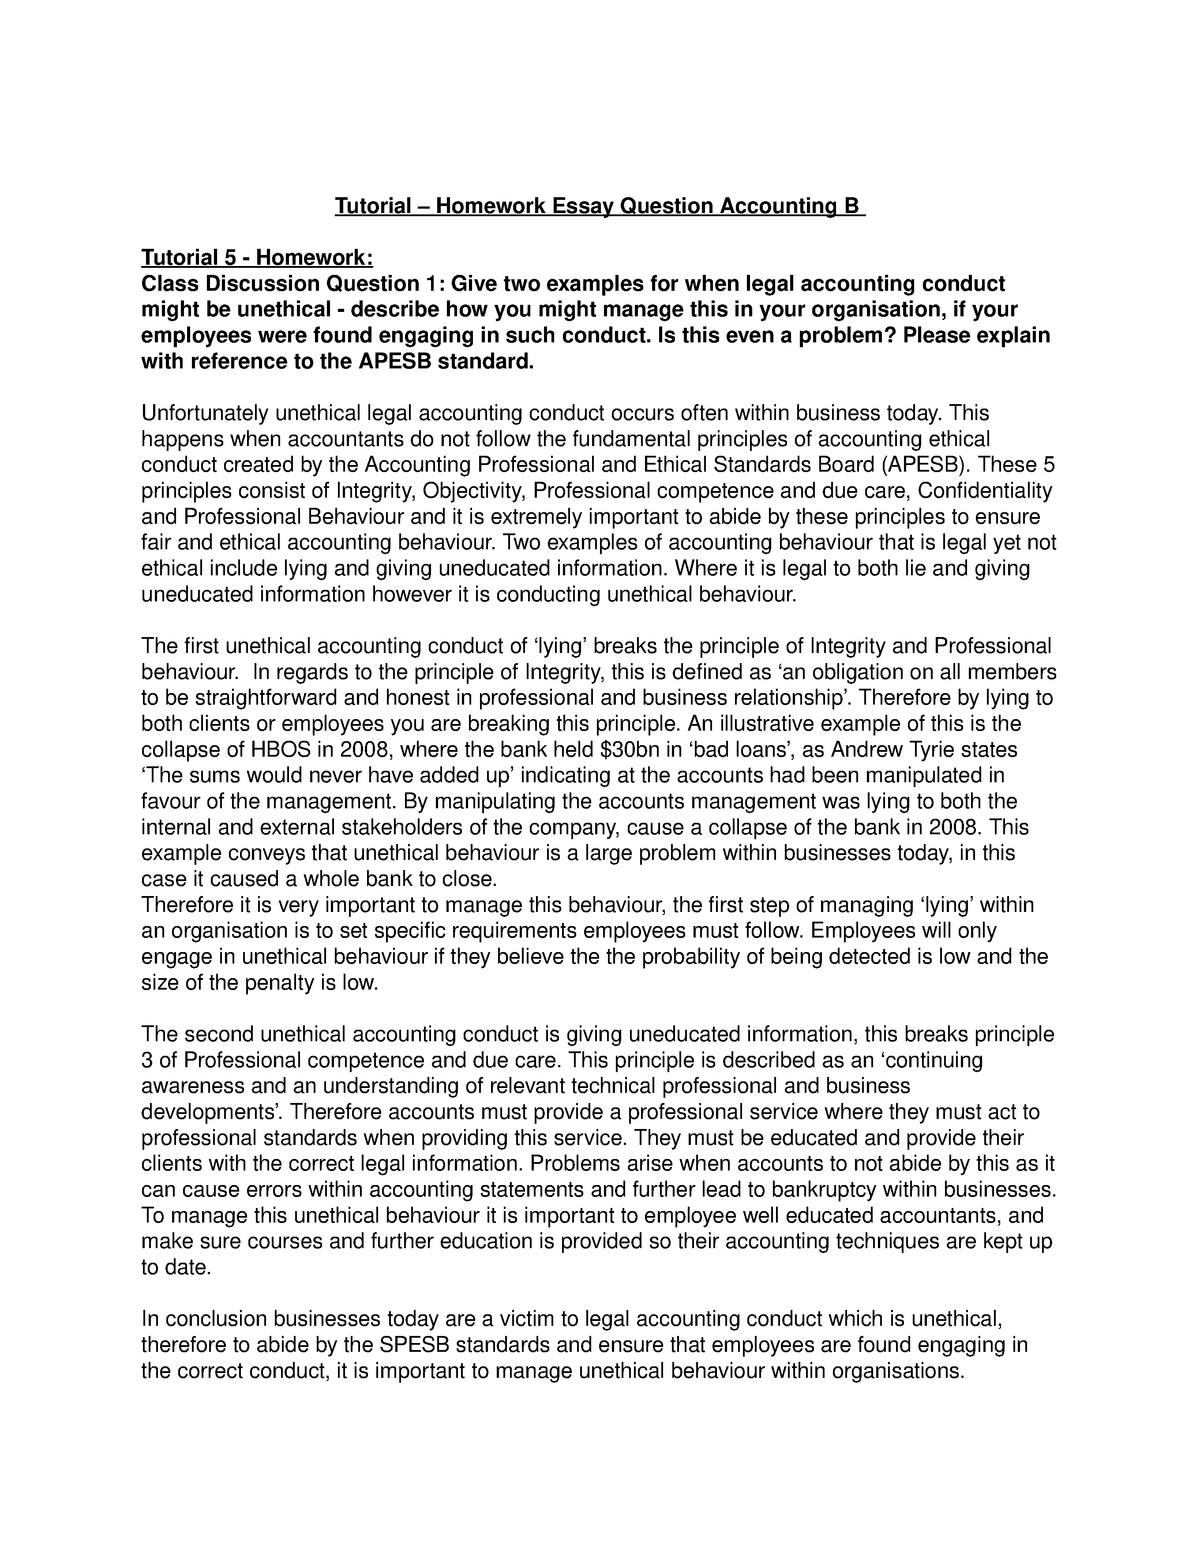 Tutorial – Homework Essay Questions Accounting B - 22207